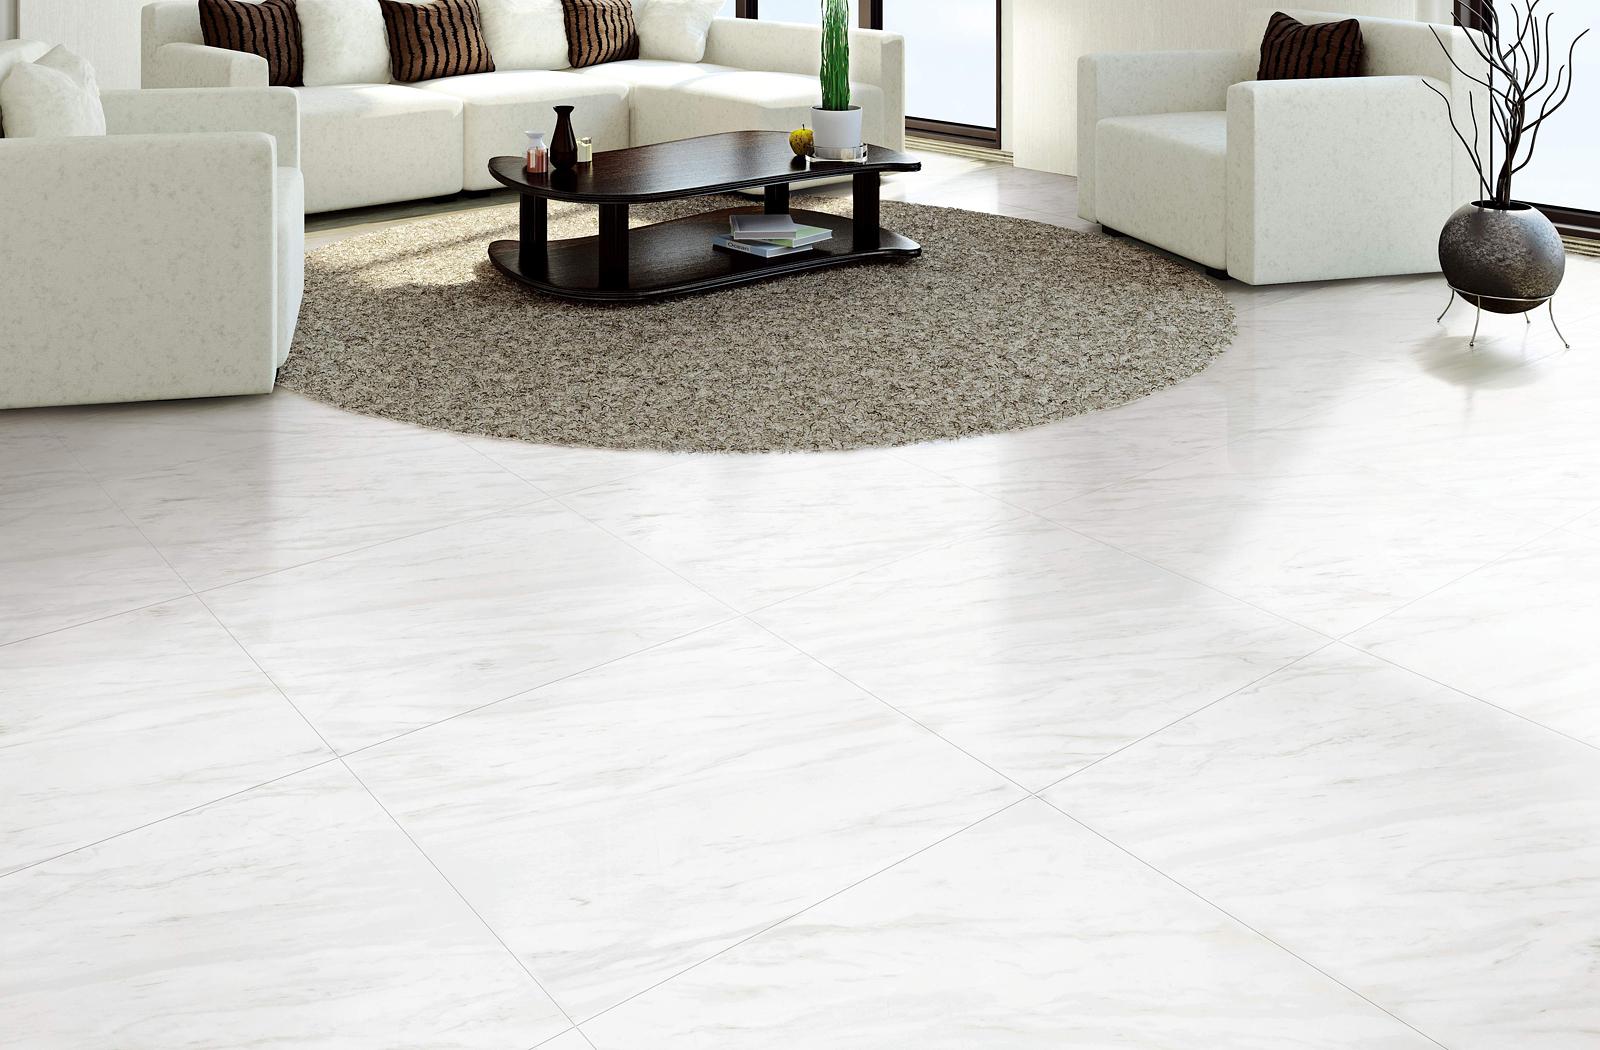 Olympia ceramic tile